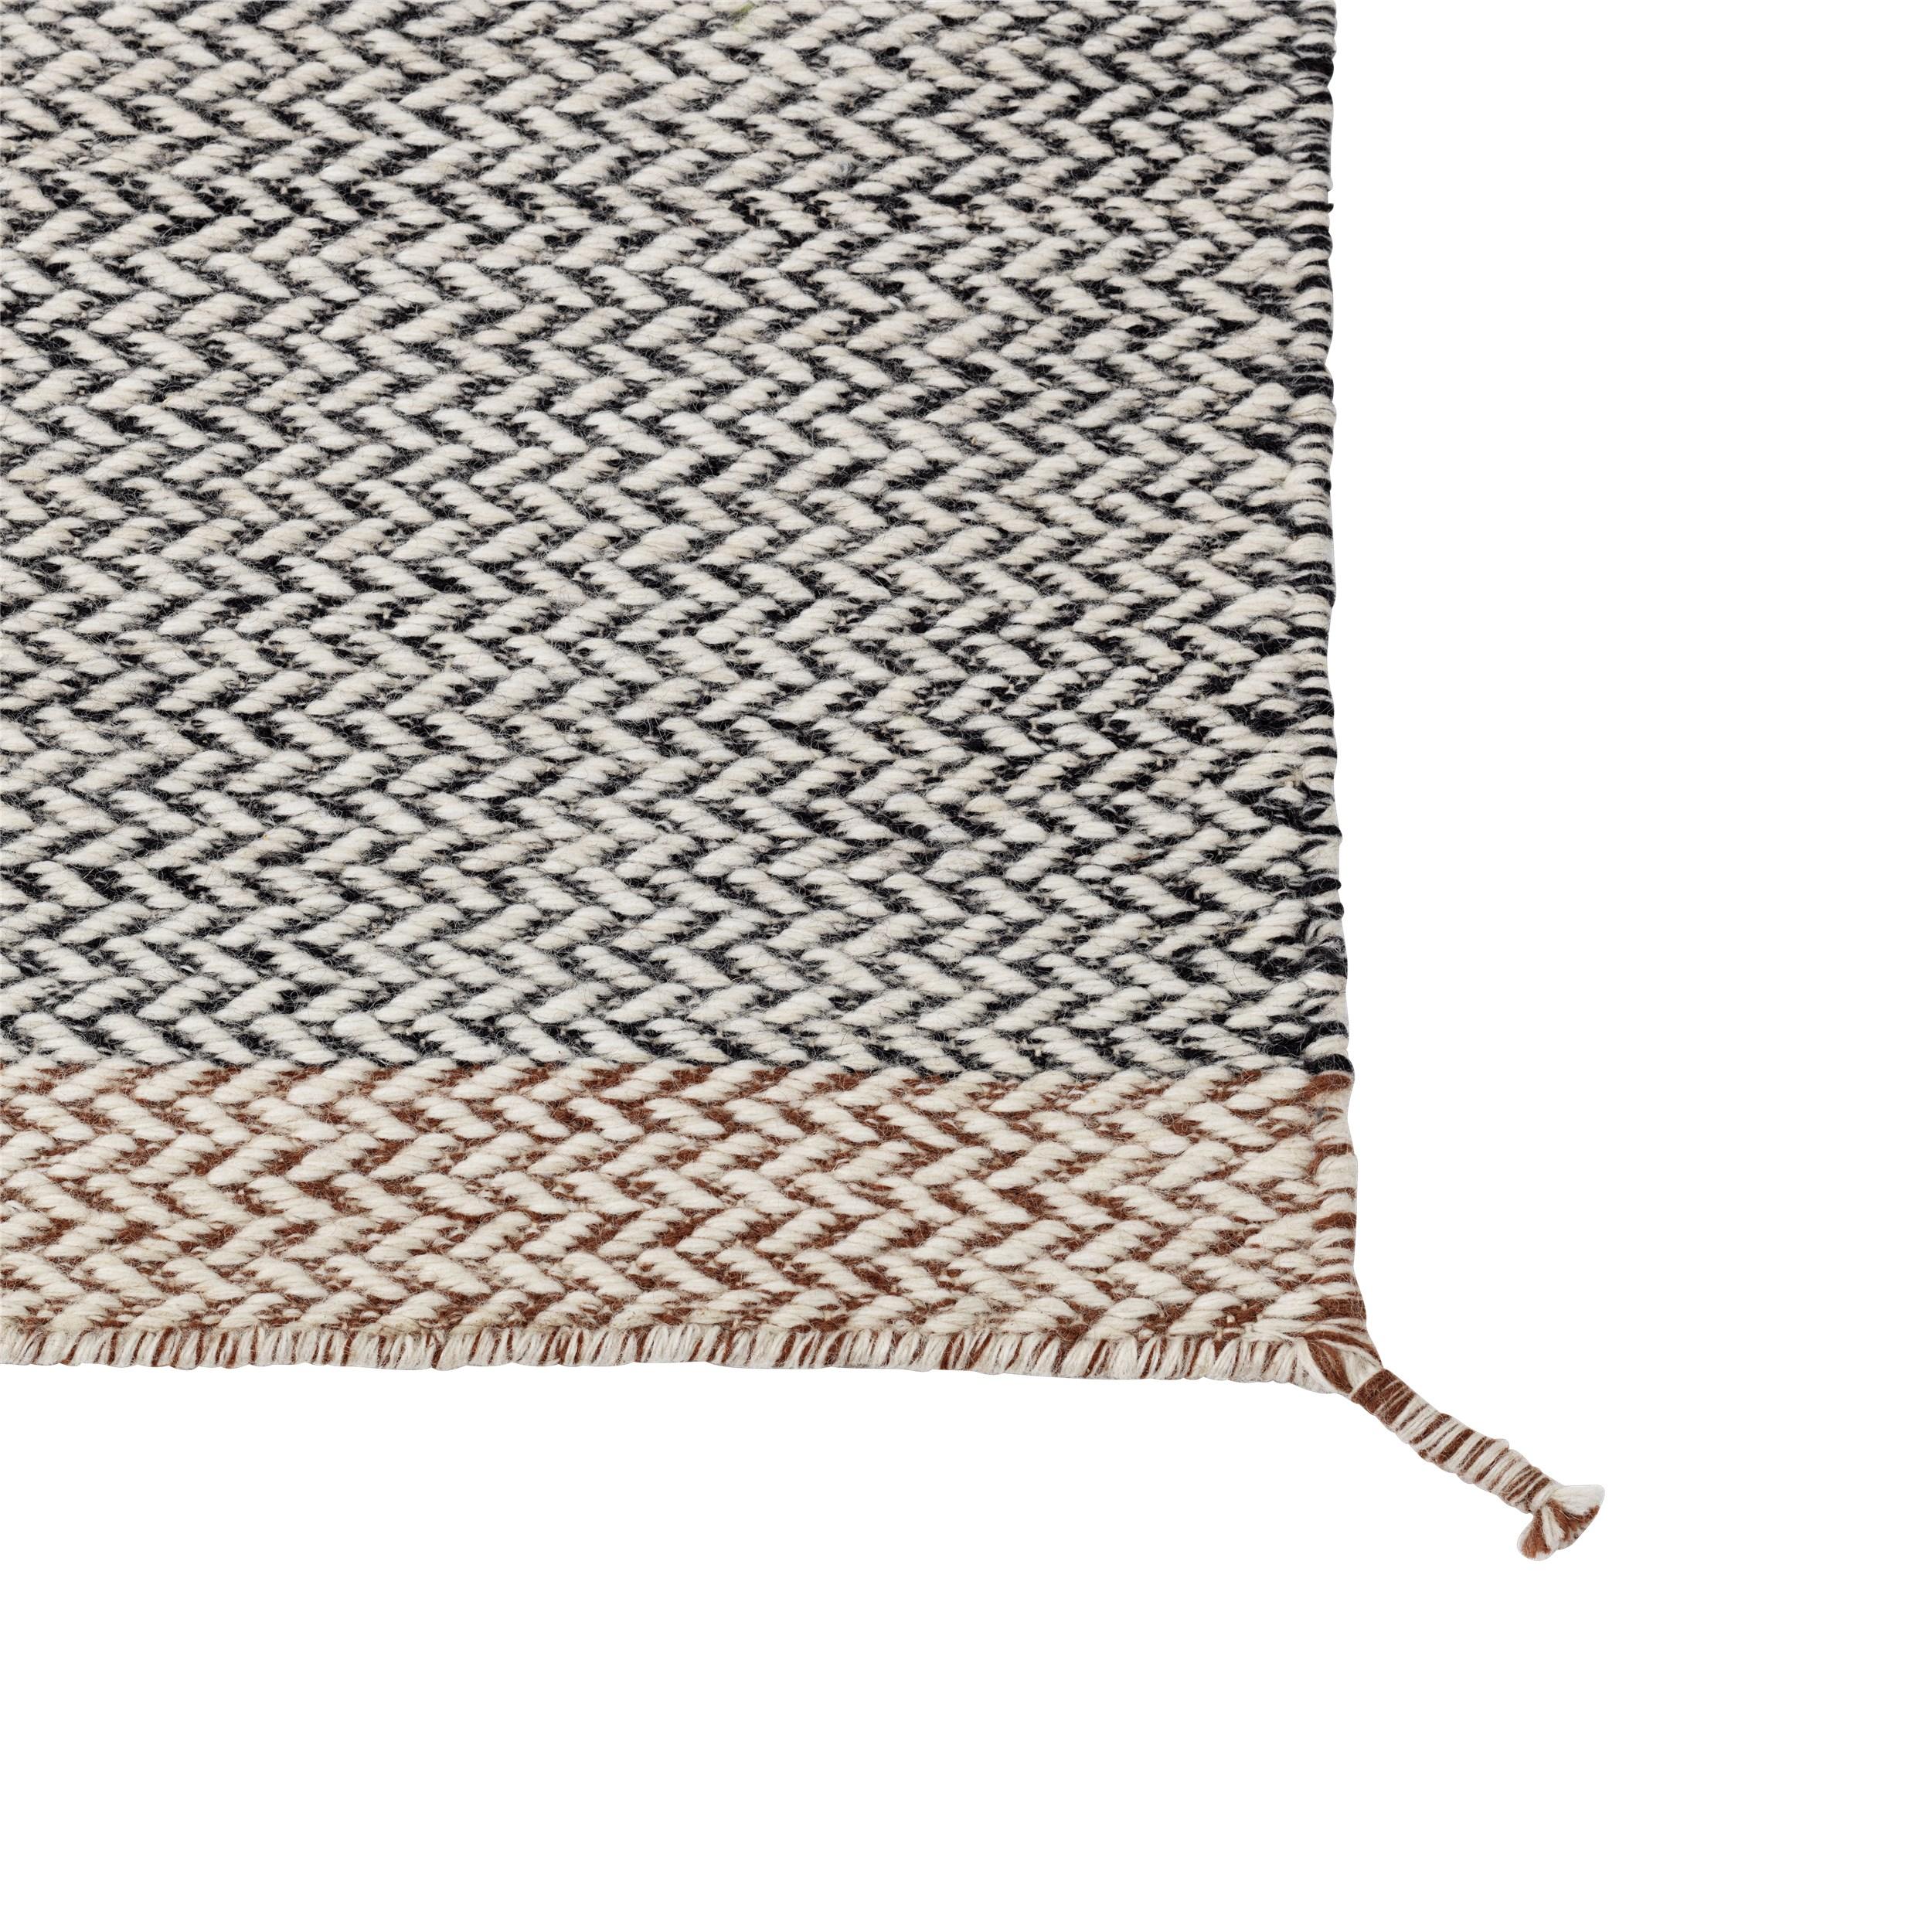 Ply rug 270 x 360 black - white